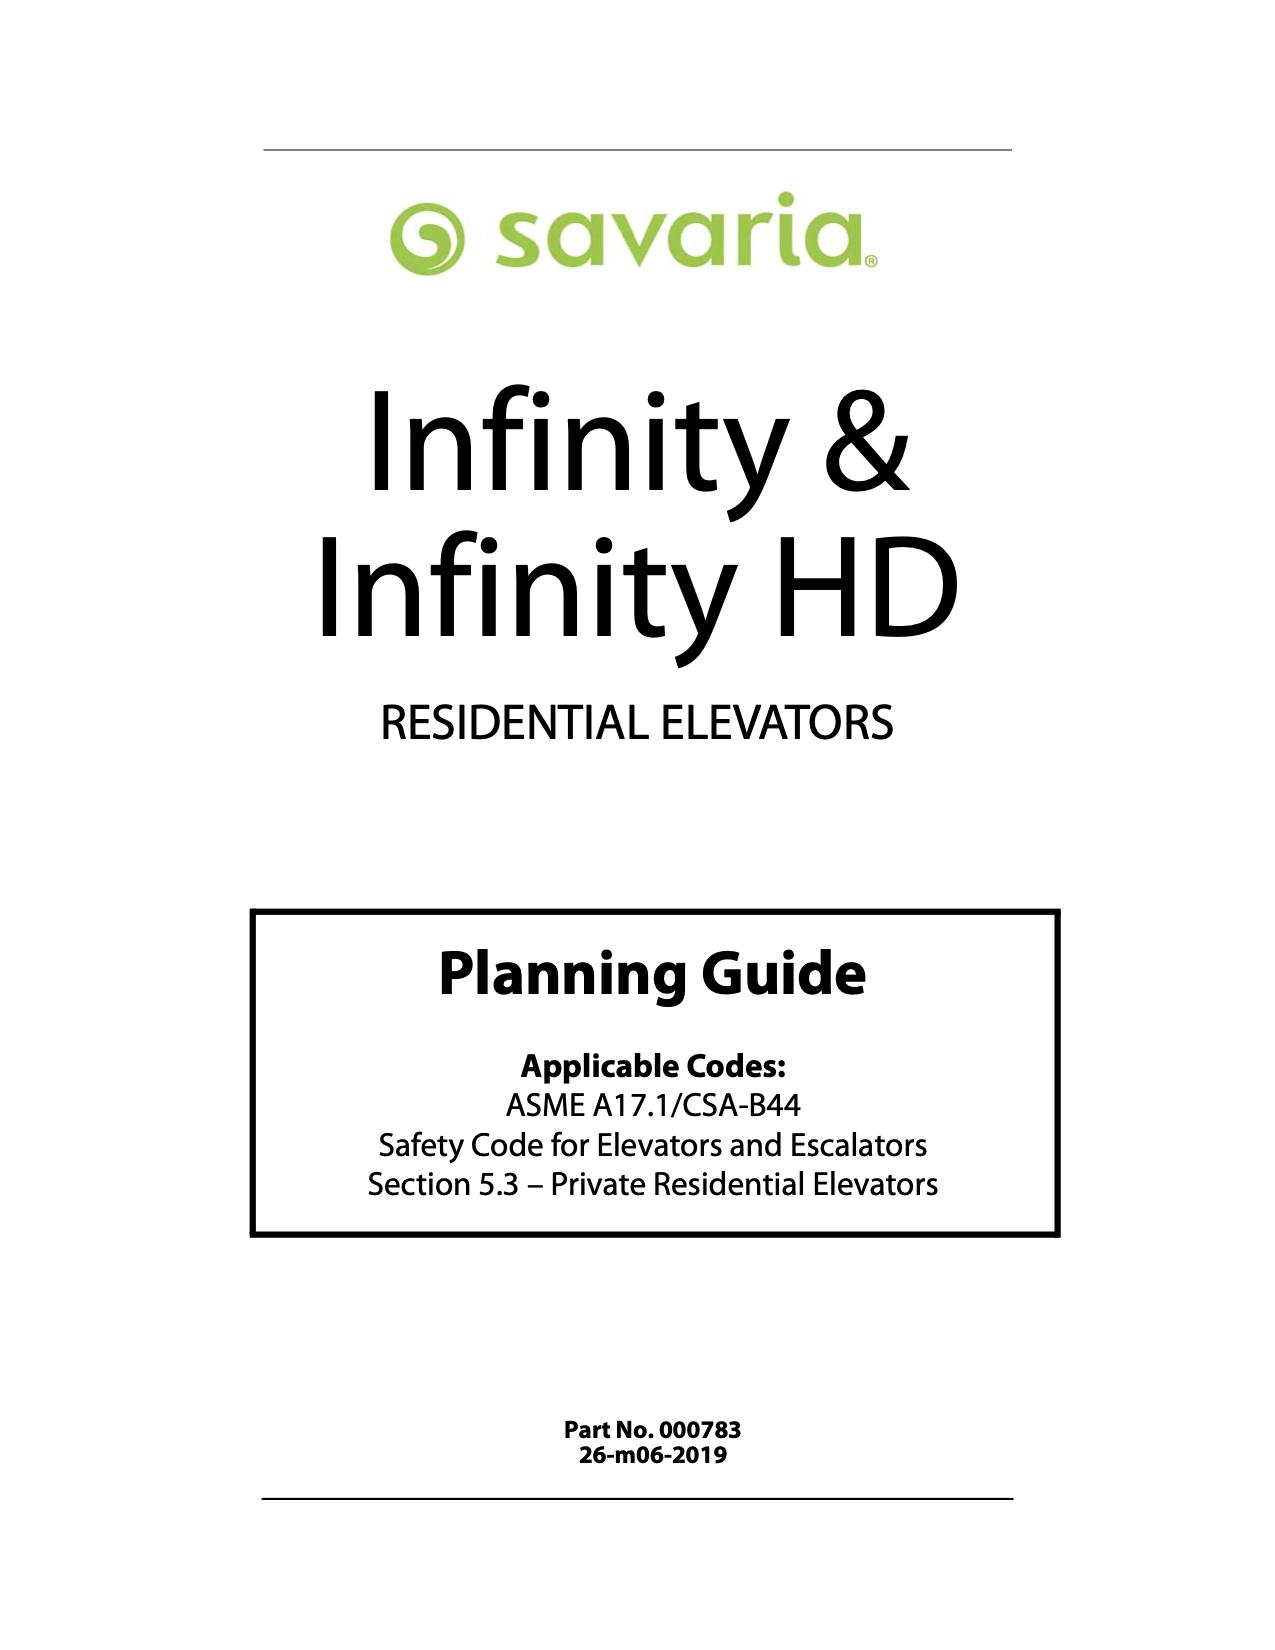 Savaria Elevators Infinity Planning Guide